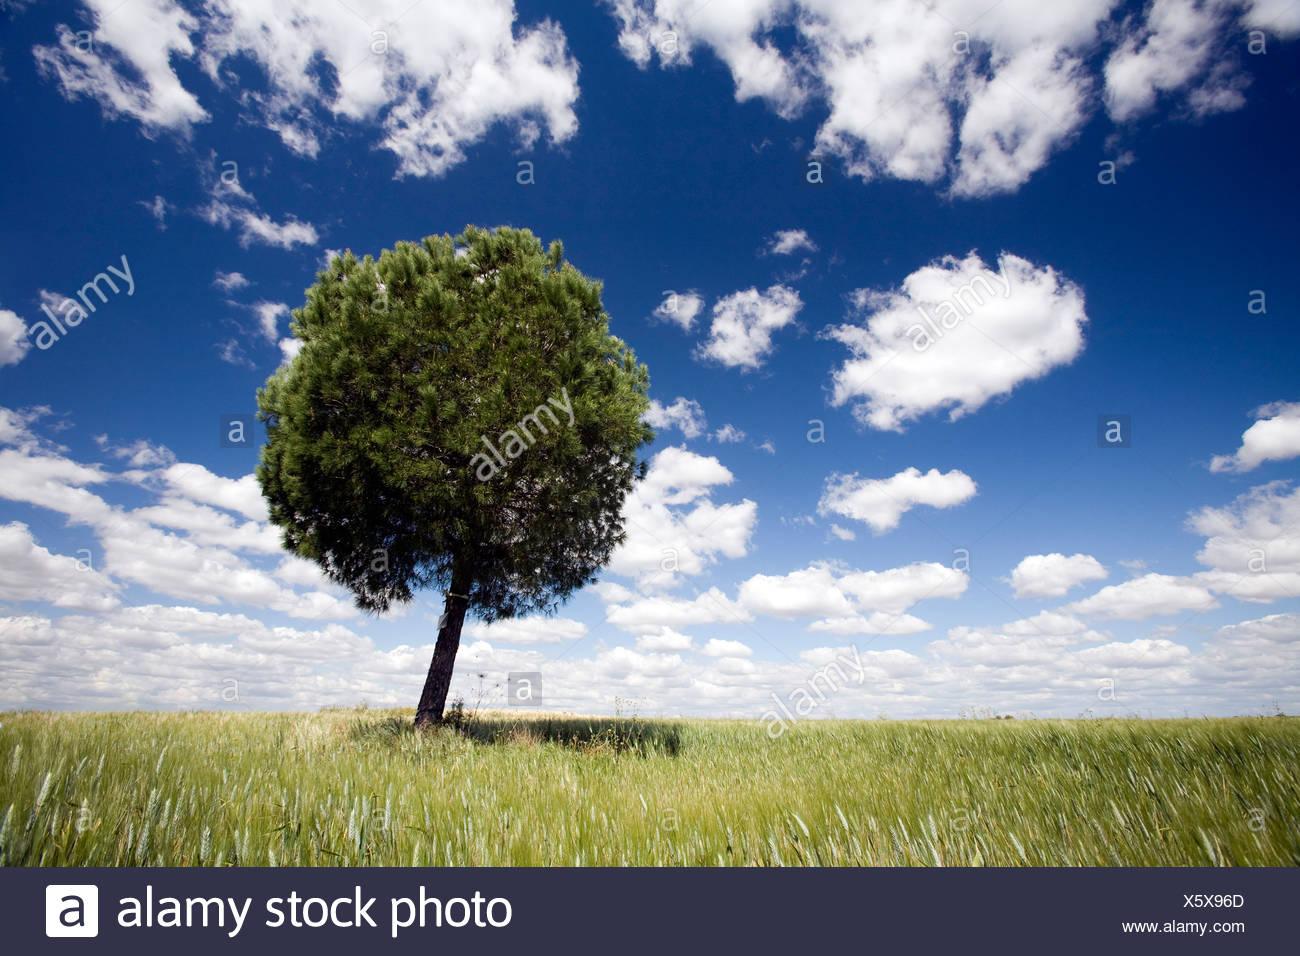 A tree in a wheat field, Sevilla, Spain - Stock Image